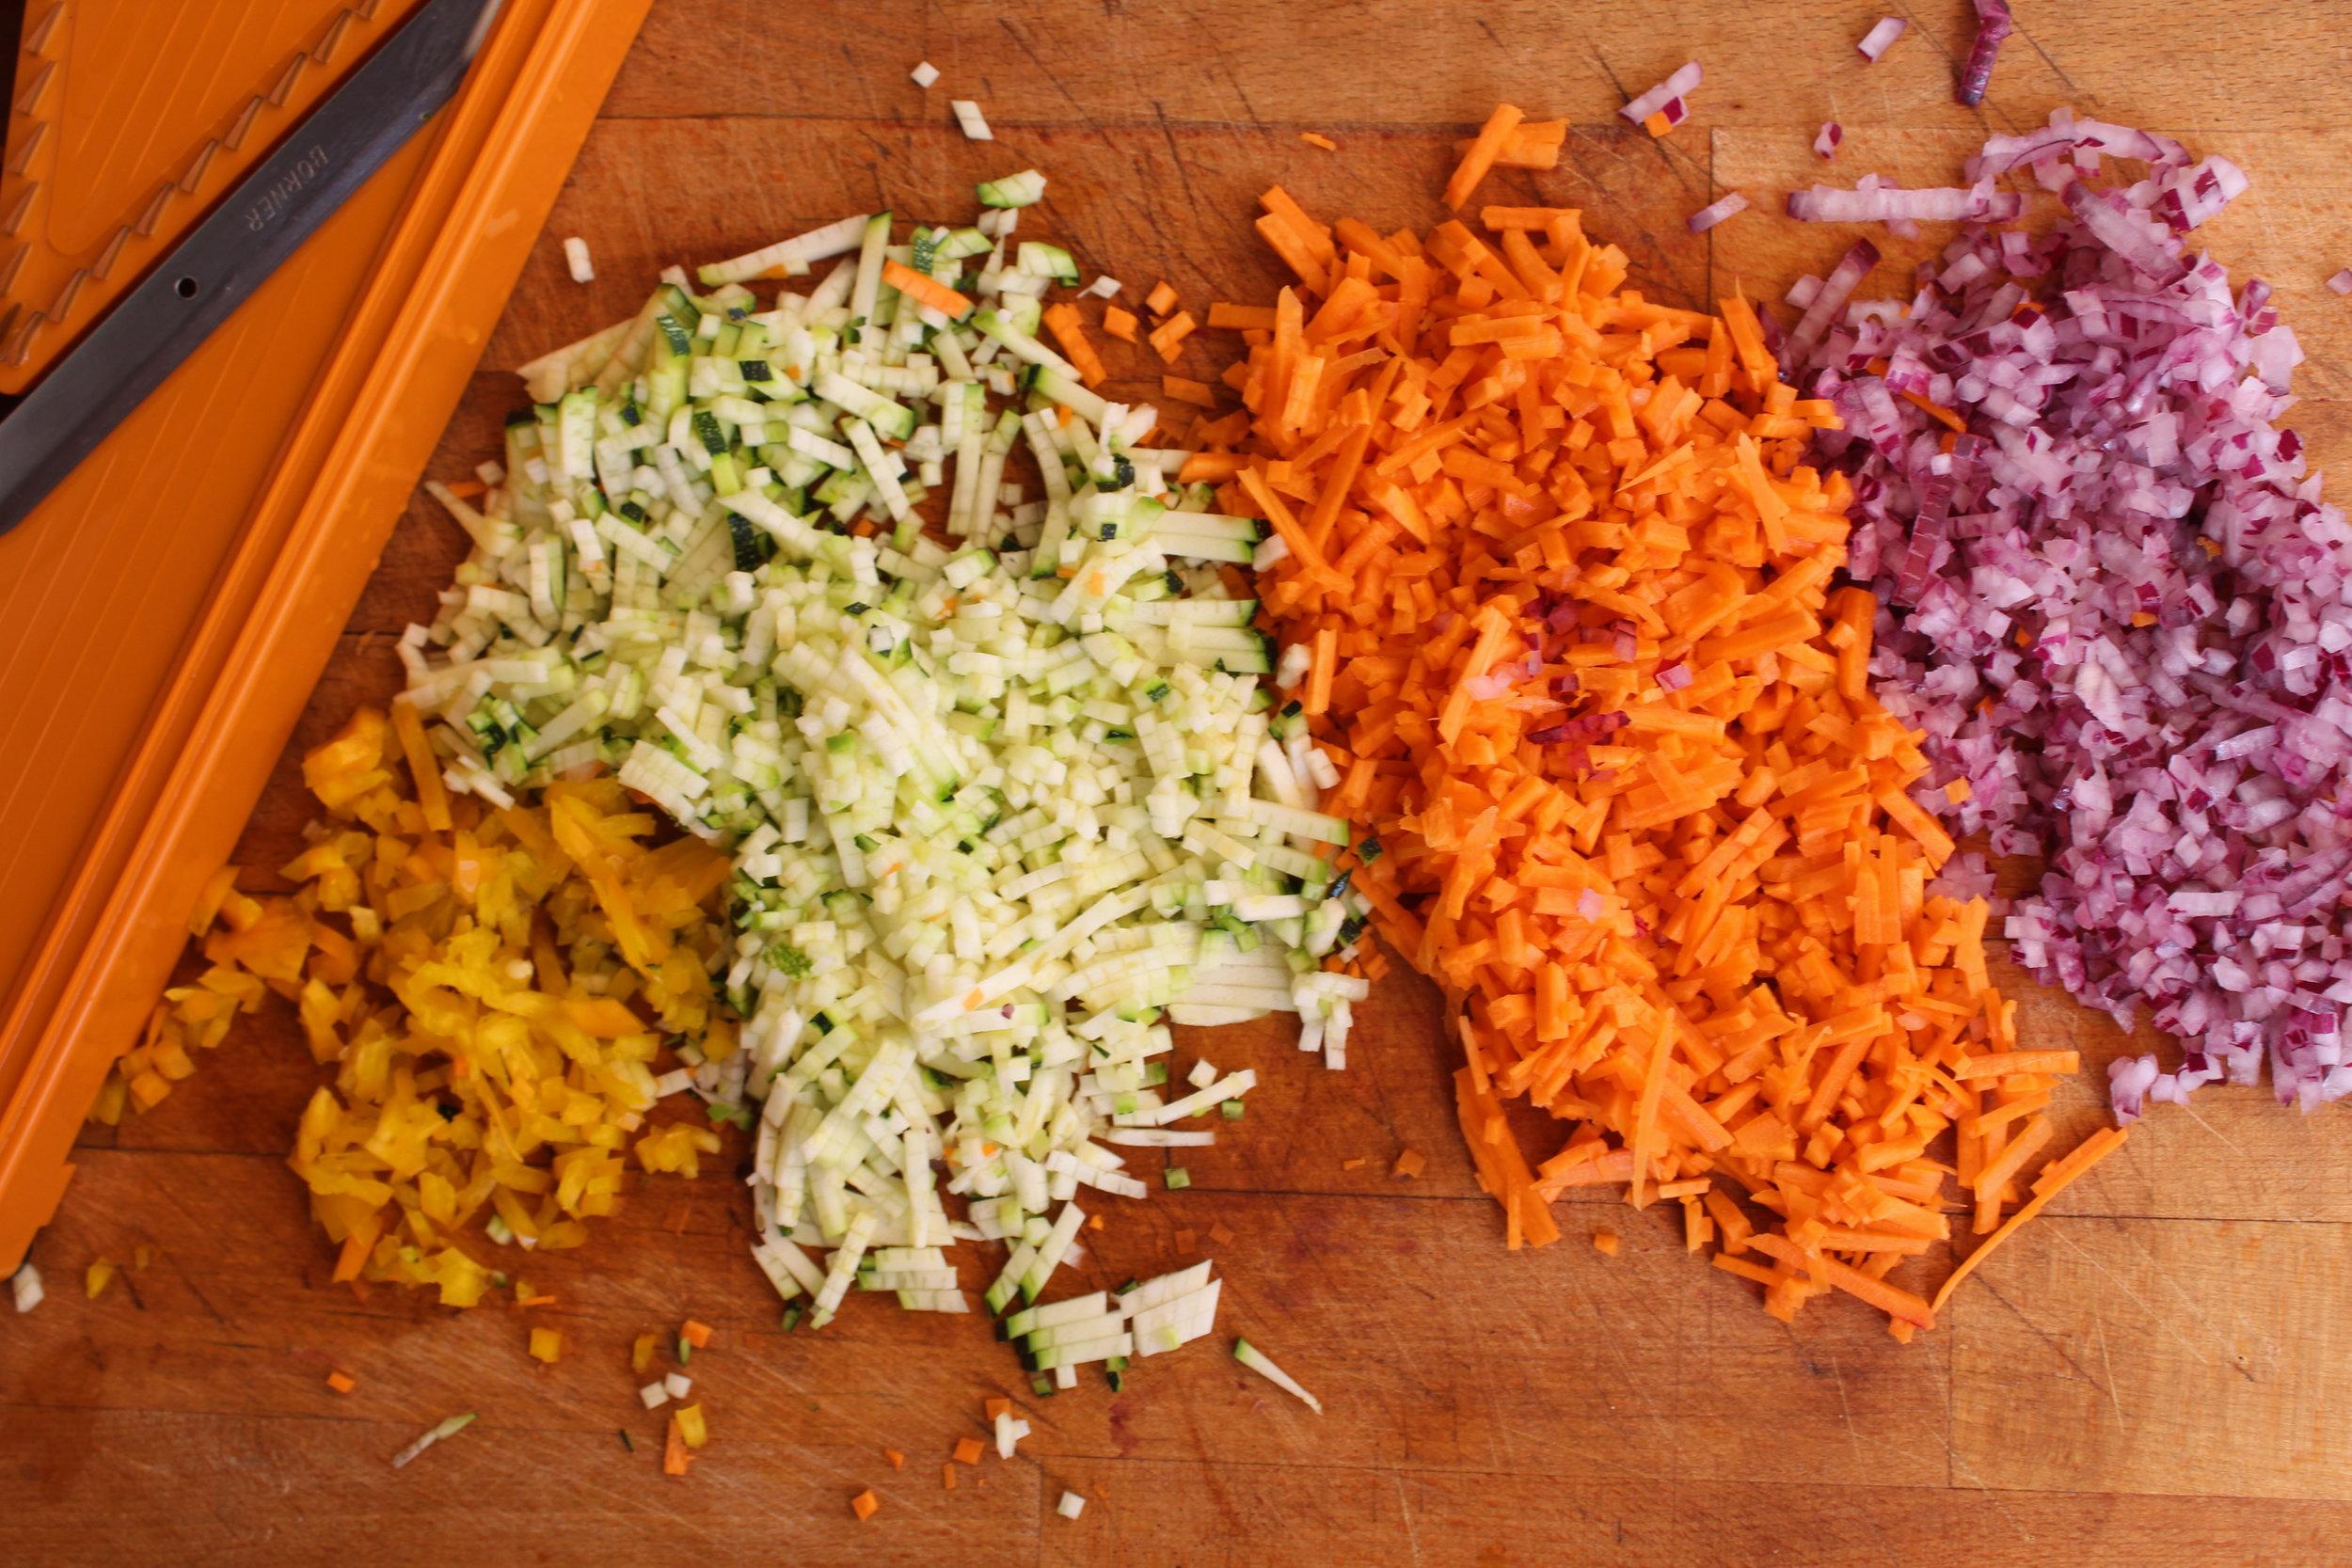 Rolo de Carne com legumes foto.JPG